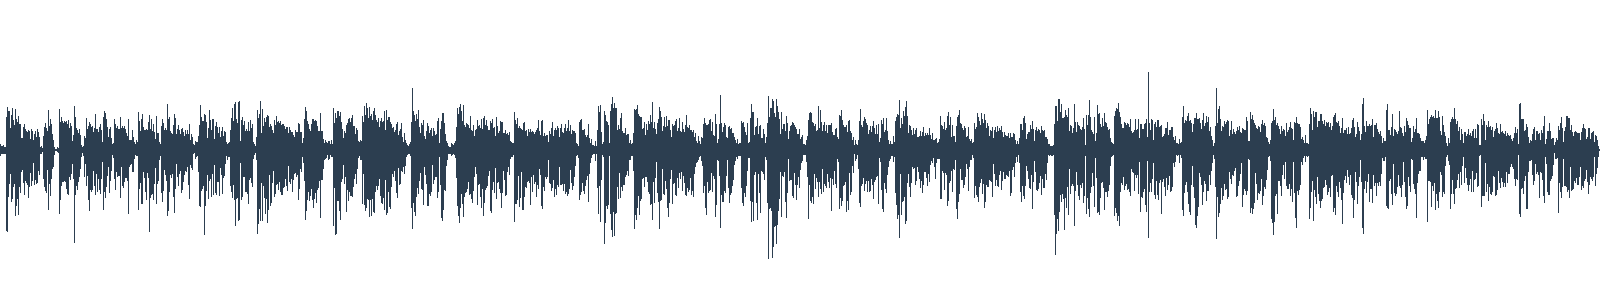 Nové audioknihy 19b/2019 waveform